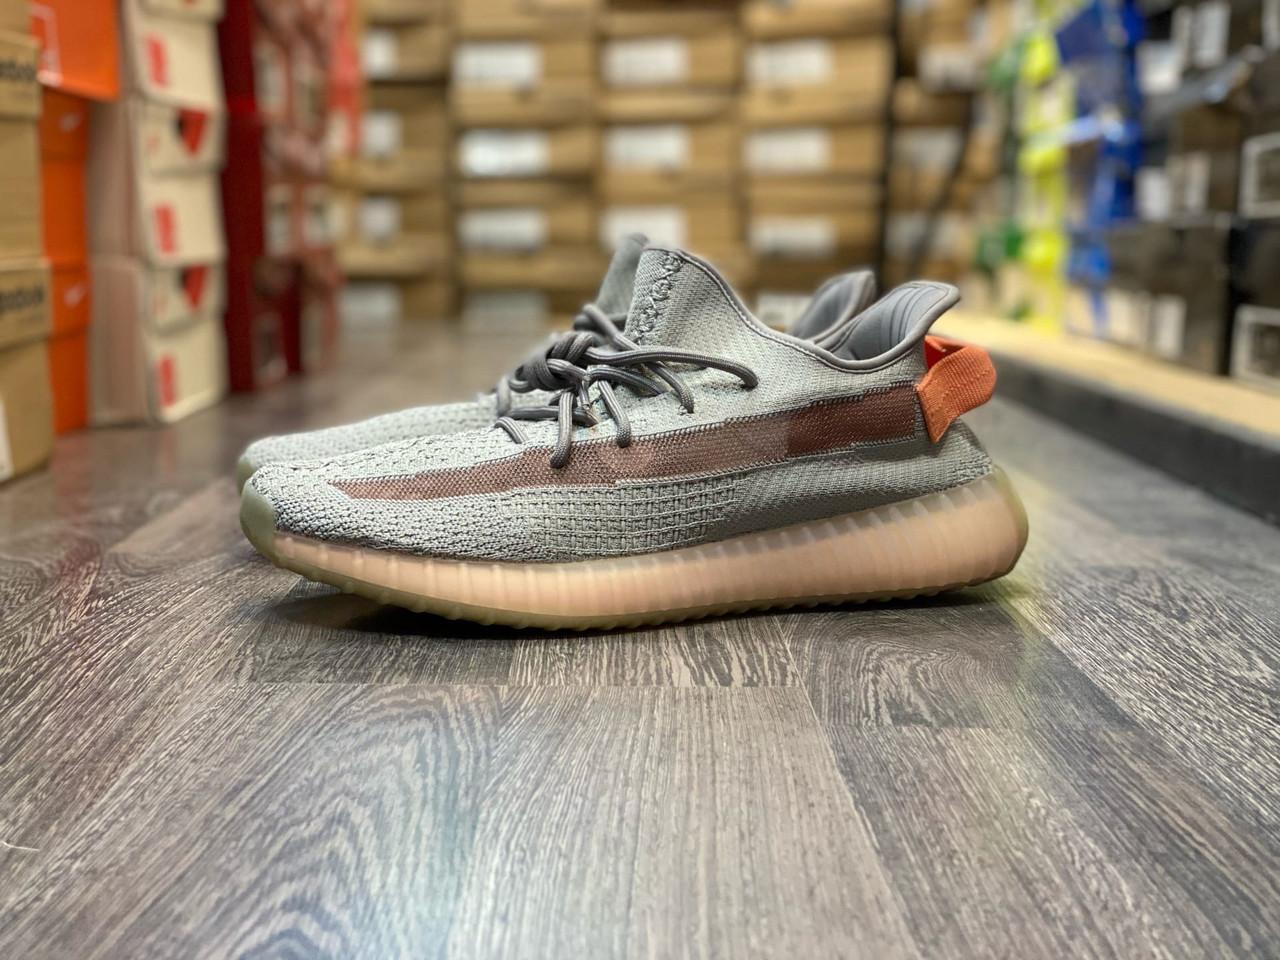 Кроссовки Adidas Yeezy Boost 350 V2 - фото 1